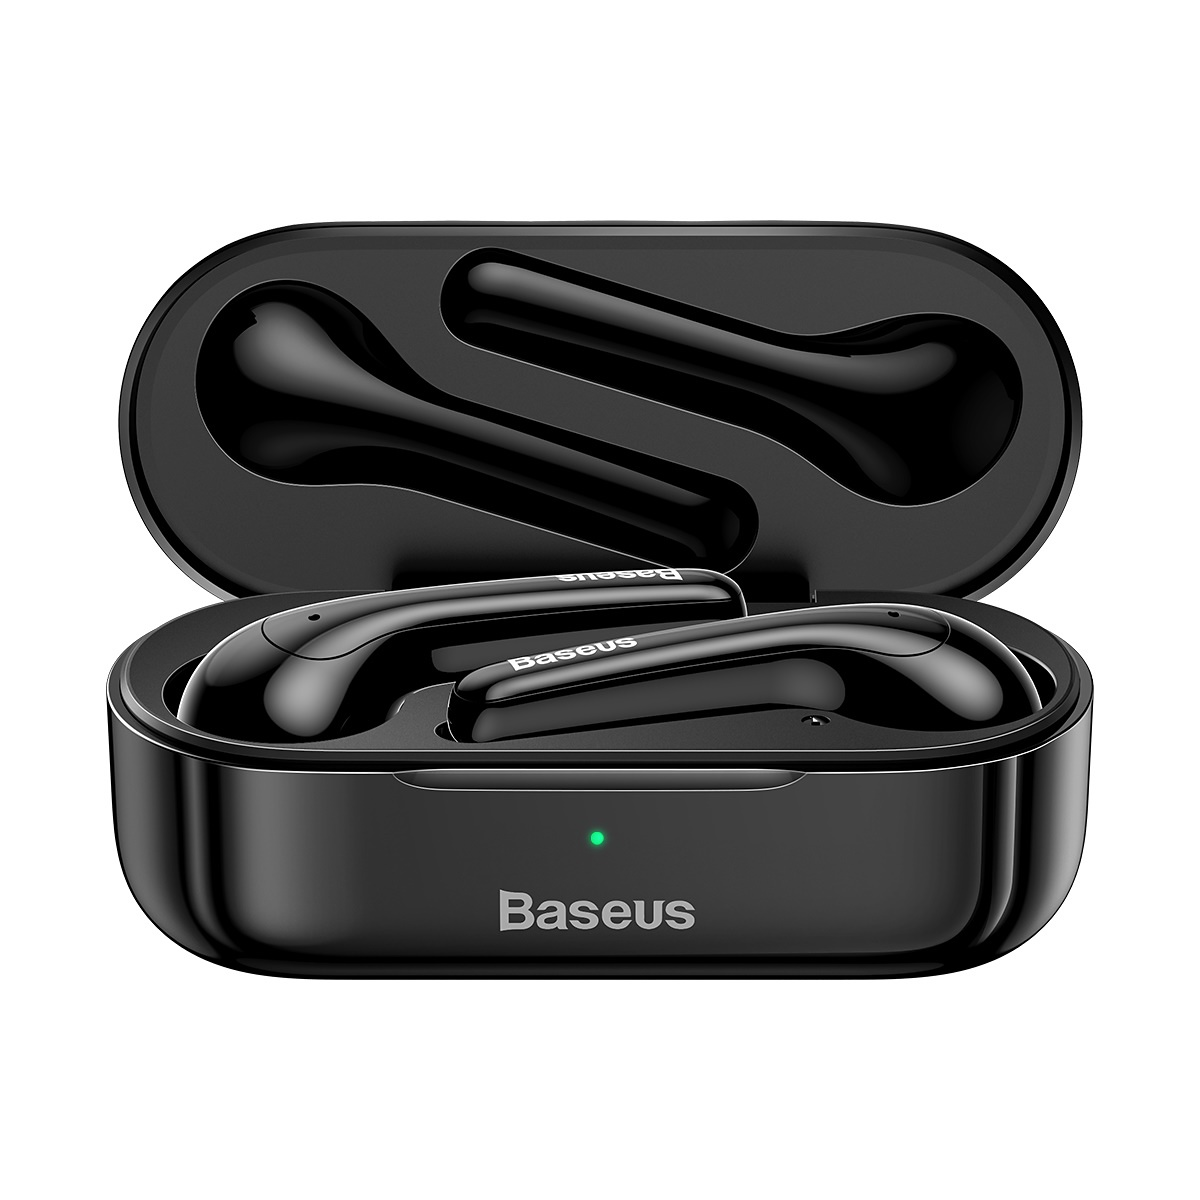 Baseus NGW07-01 Encok Trådlösa in-ear hörlurar, BT 5.0, svart